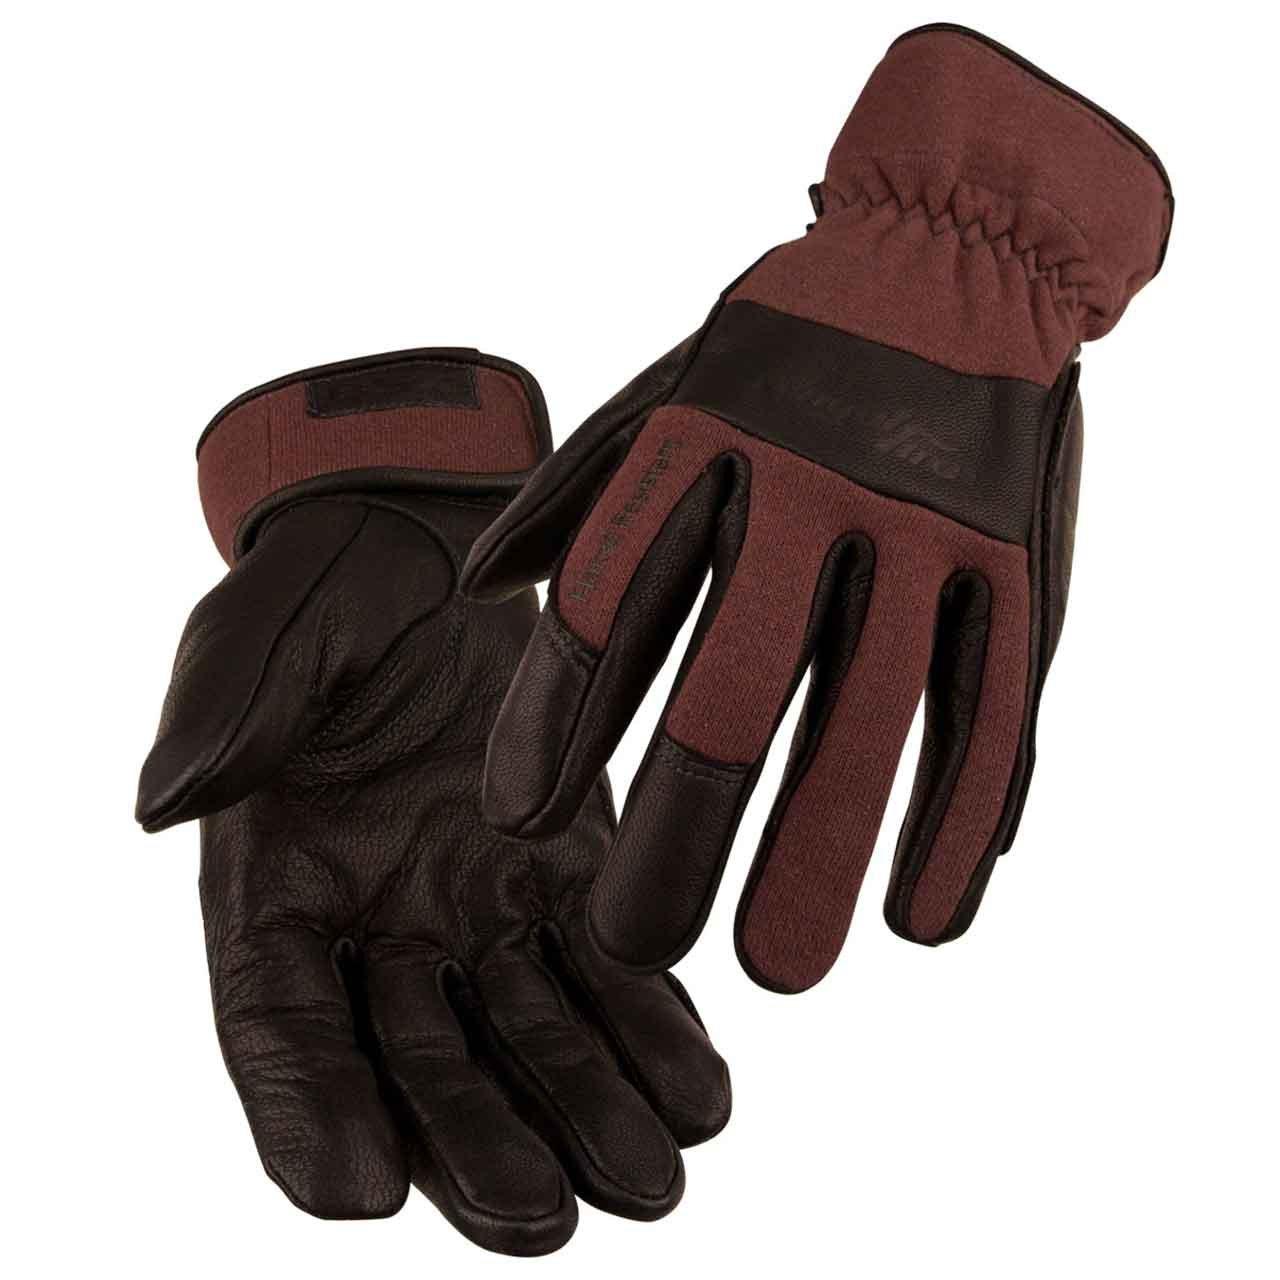 BLACK STALLION AngelFire™ Women's TIG Welding Gloves - Chocolate - MEDIUM REVCO LT50-MD